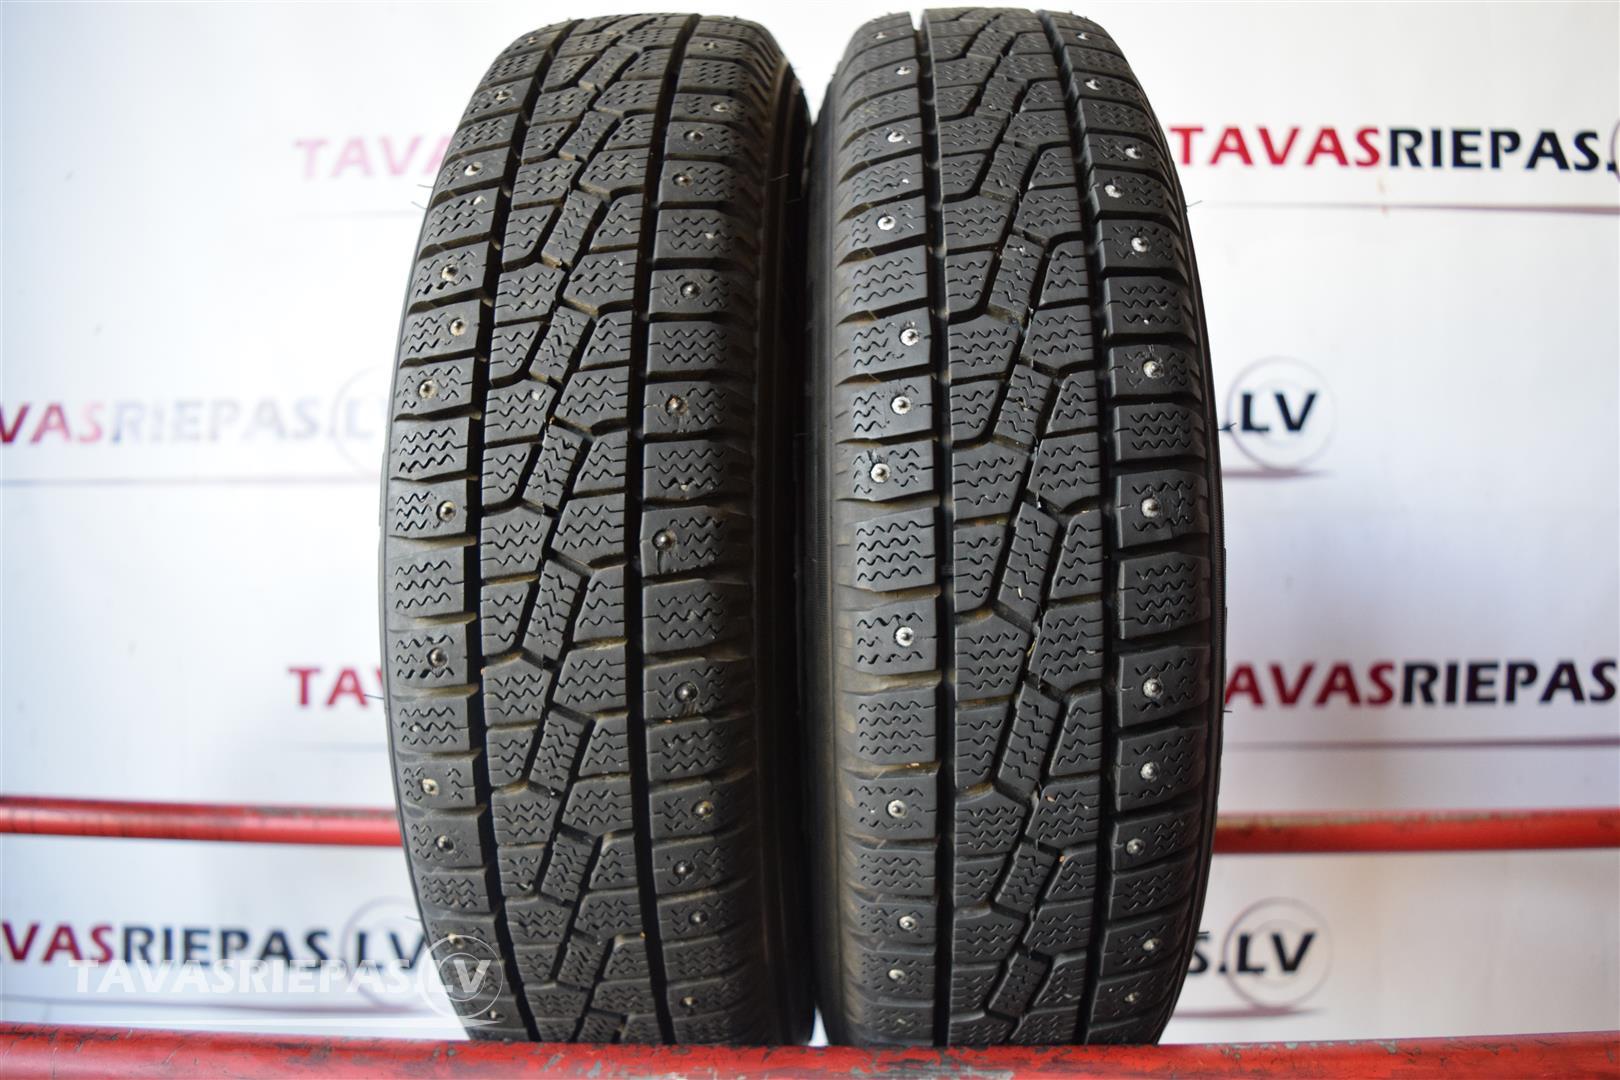 Tires Marshal Izen Stud Kw11 155 80 R13